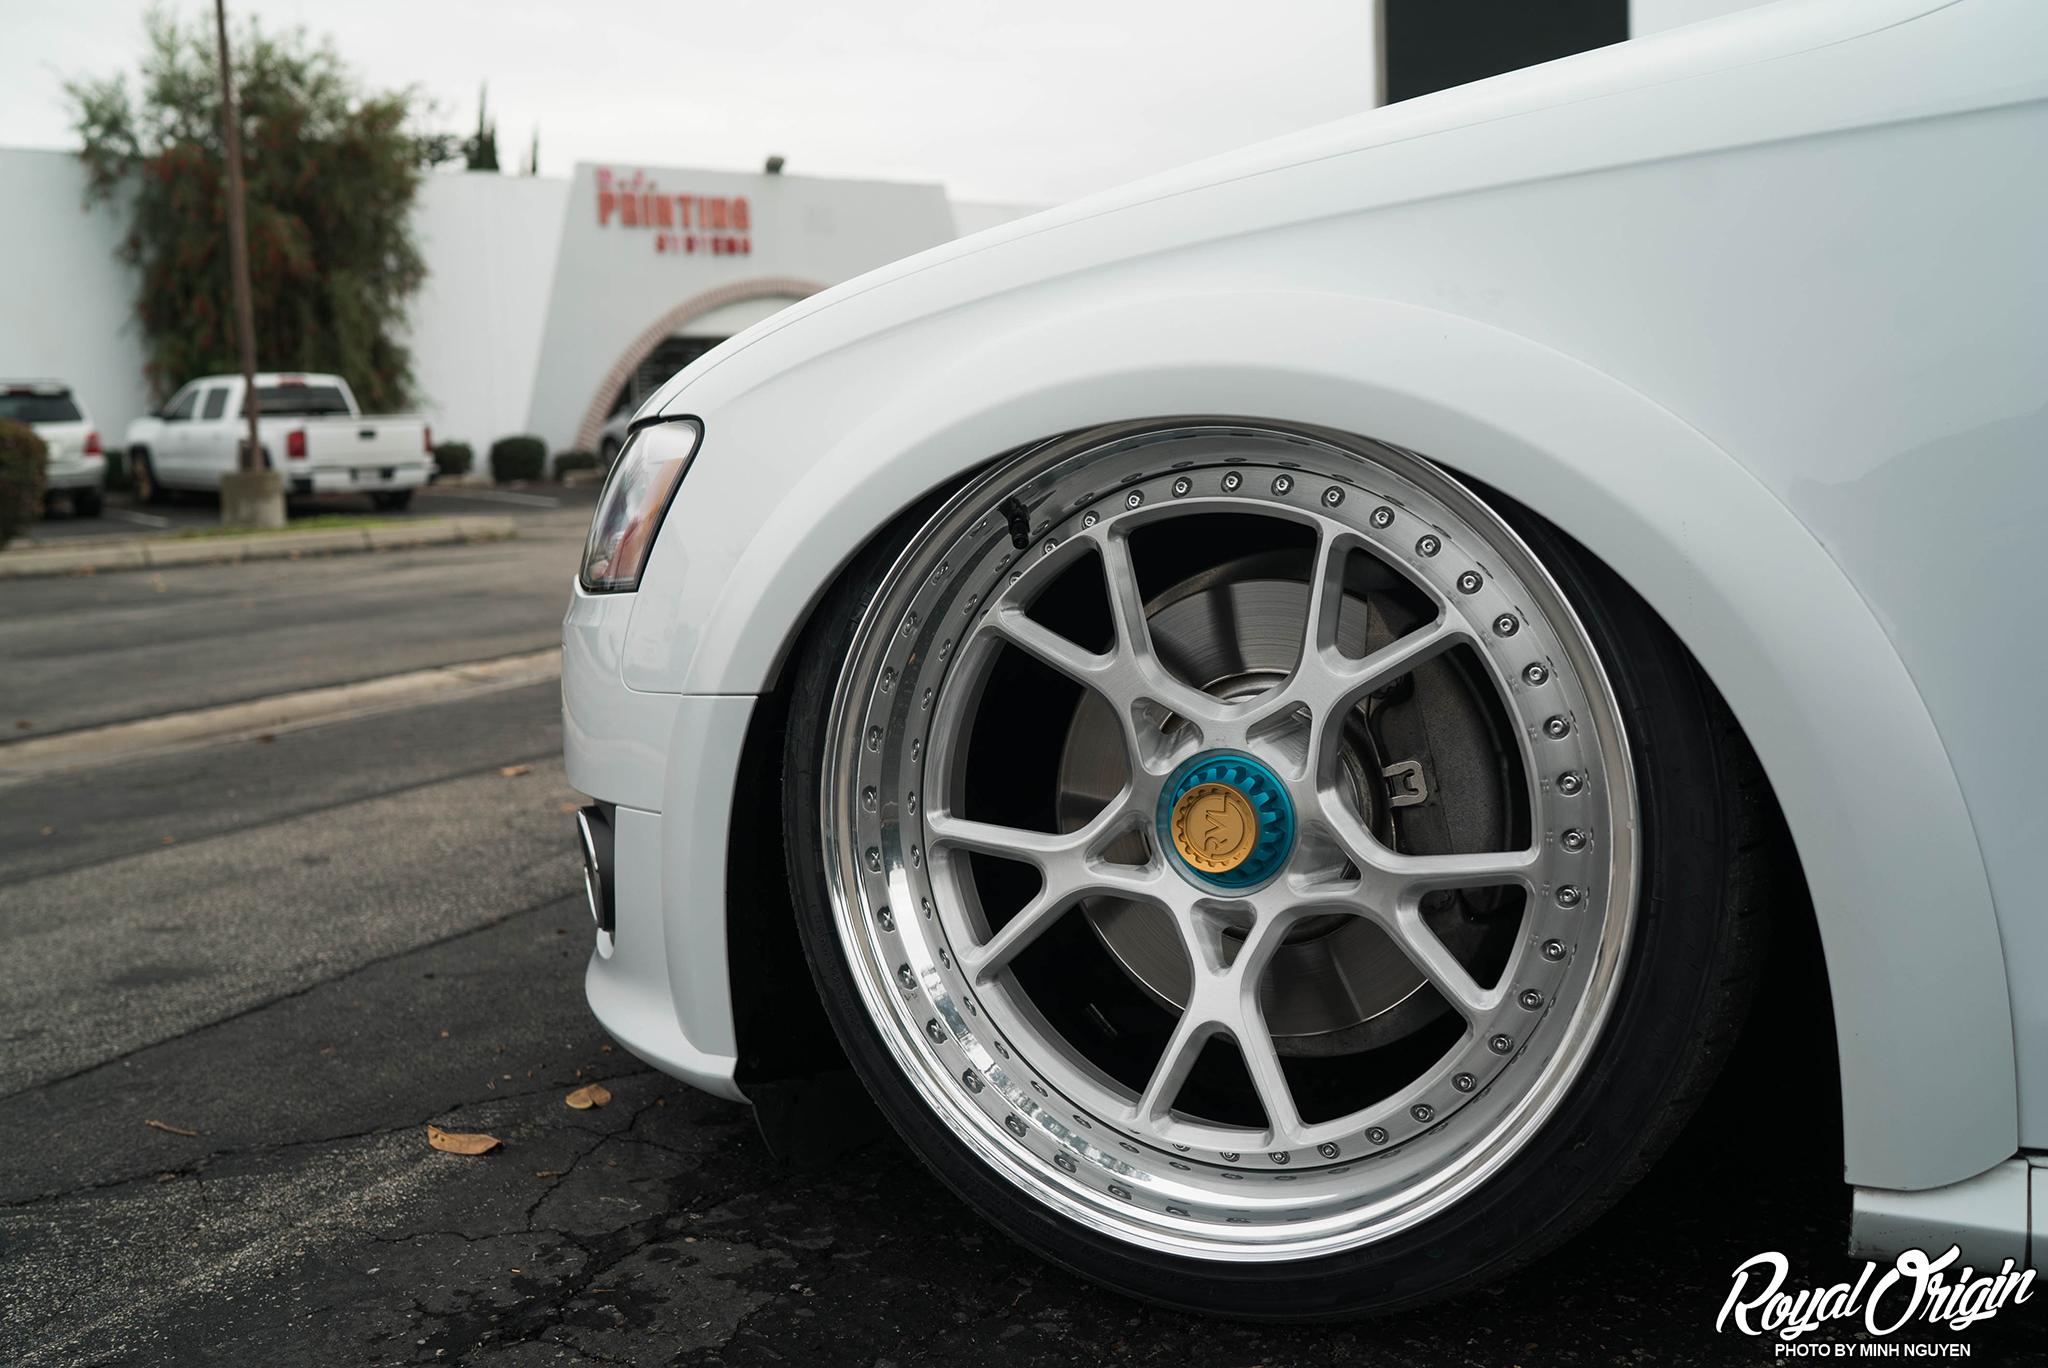 David S Audi All Road Car Feature Royal Origin